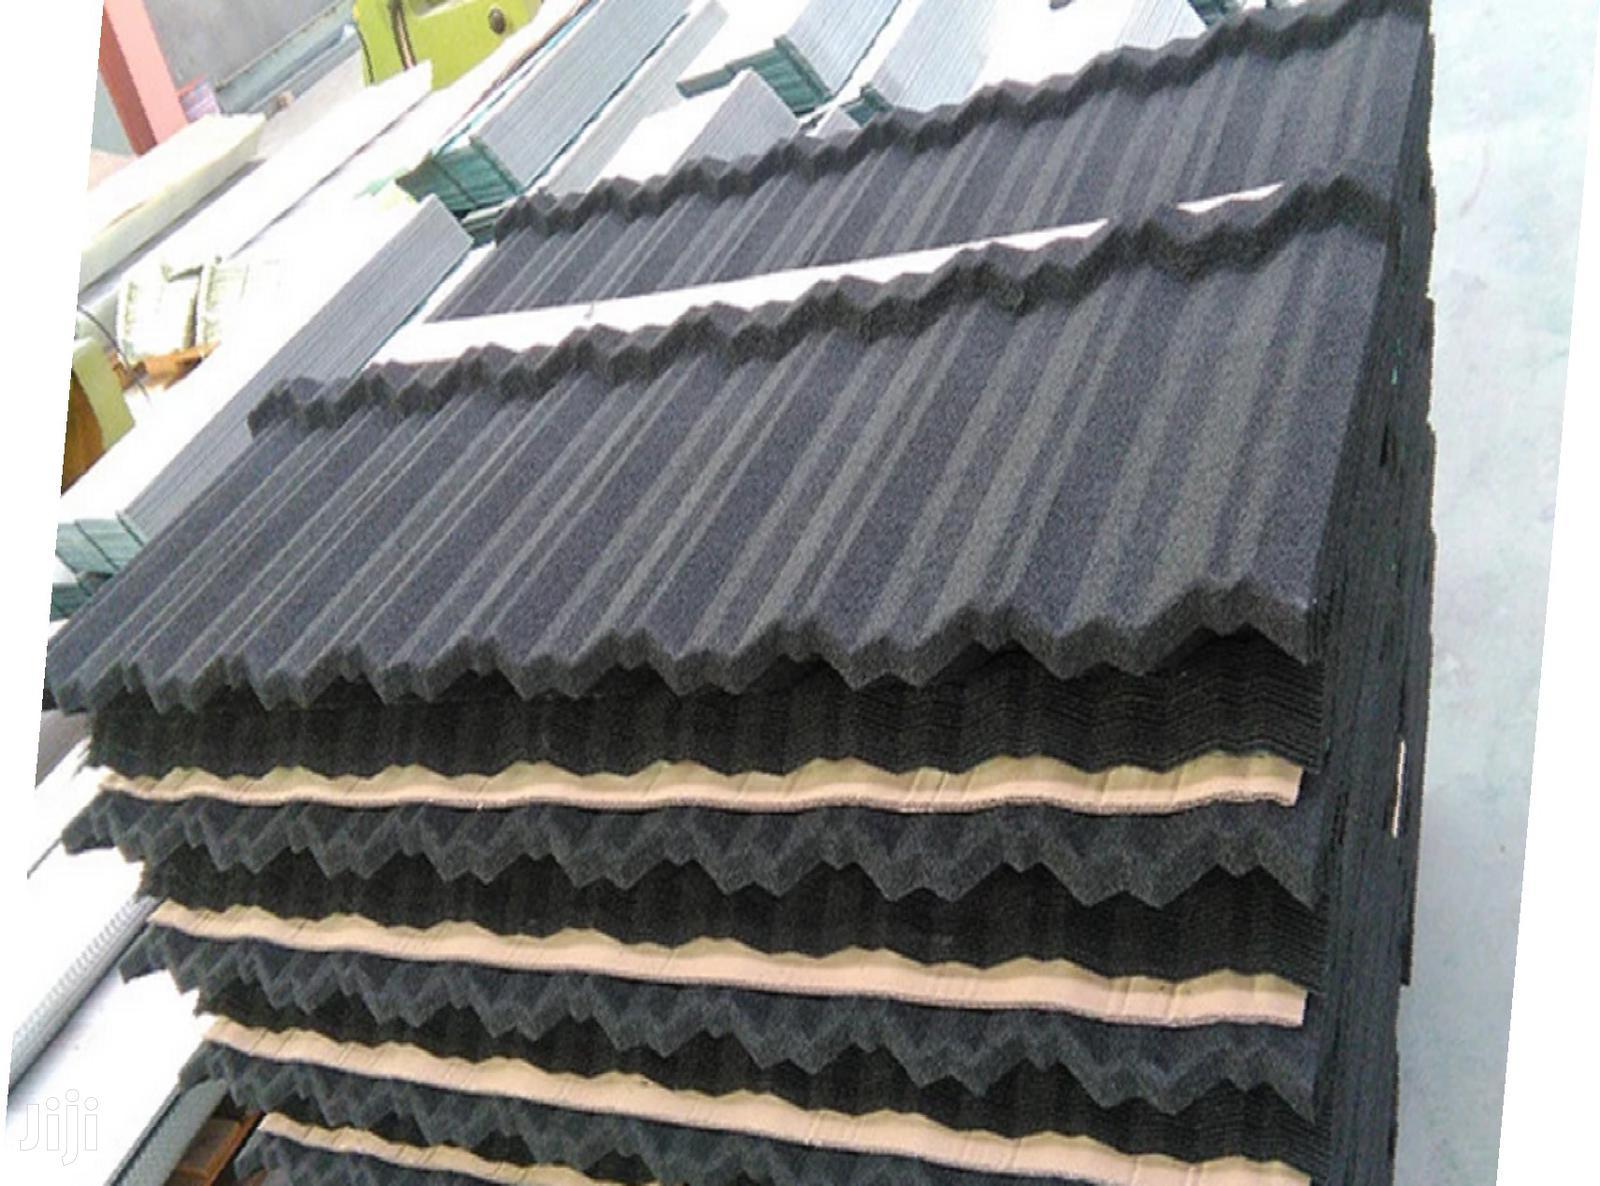 gerard plain black classic stone coated roof tiles